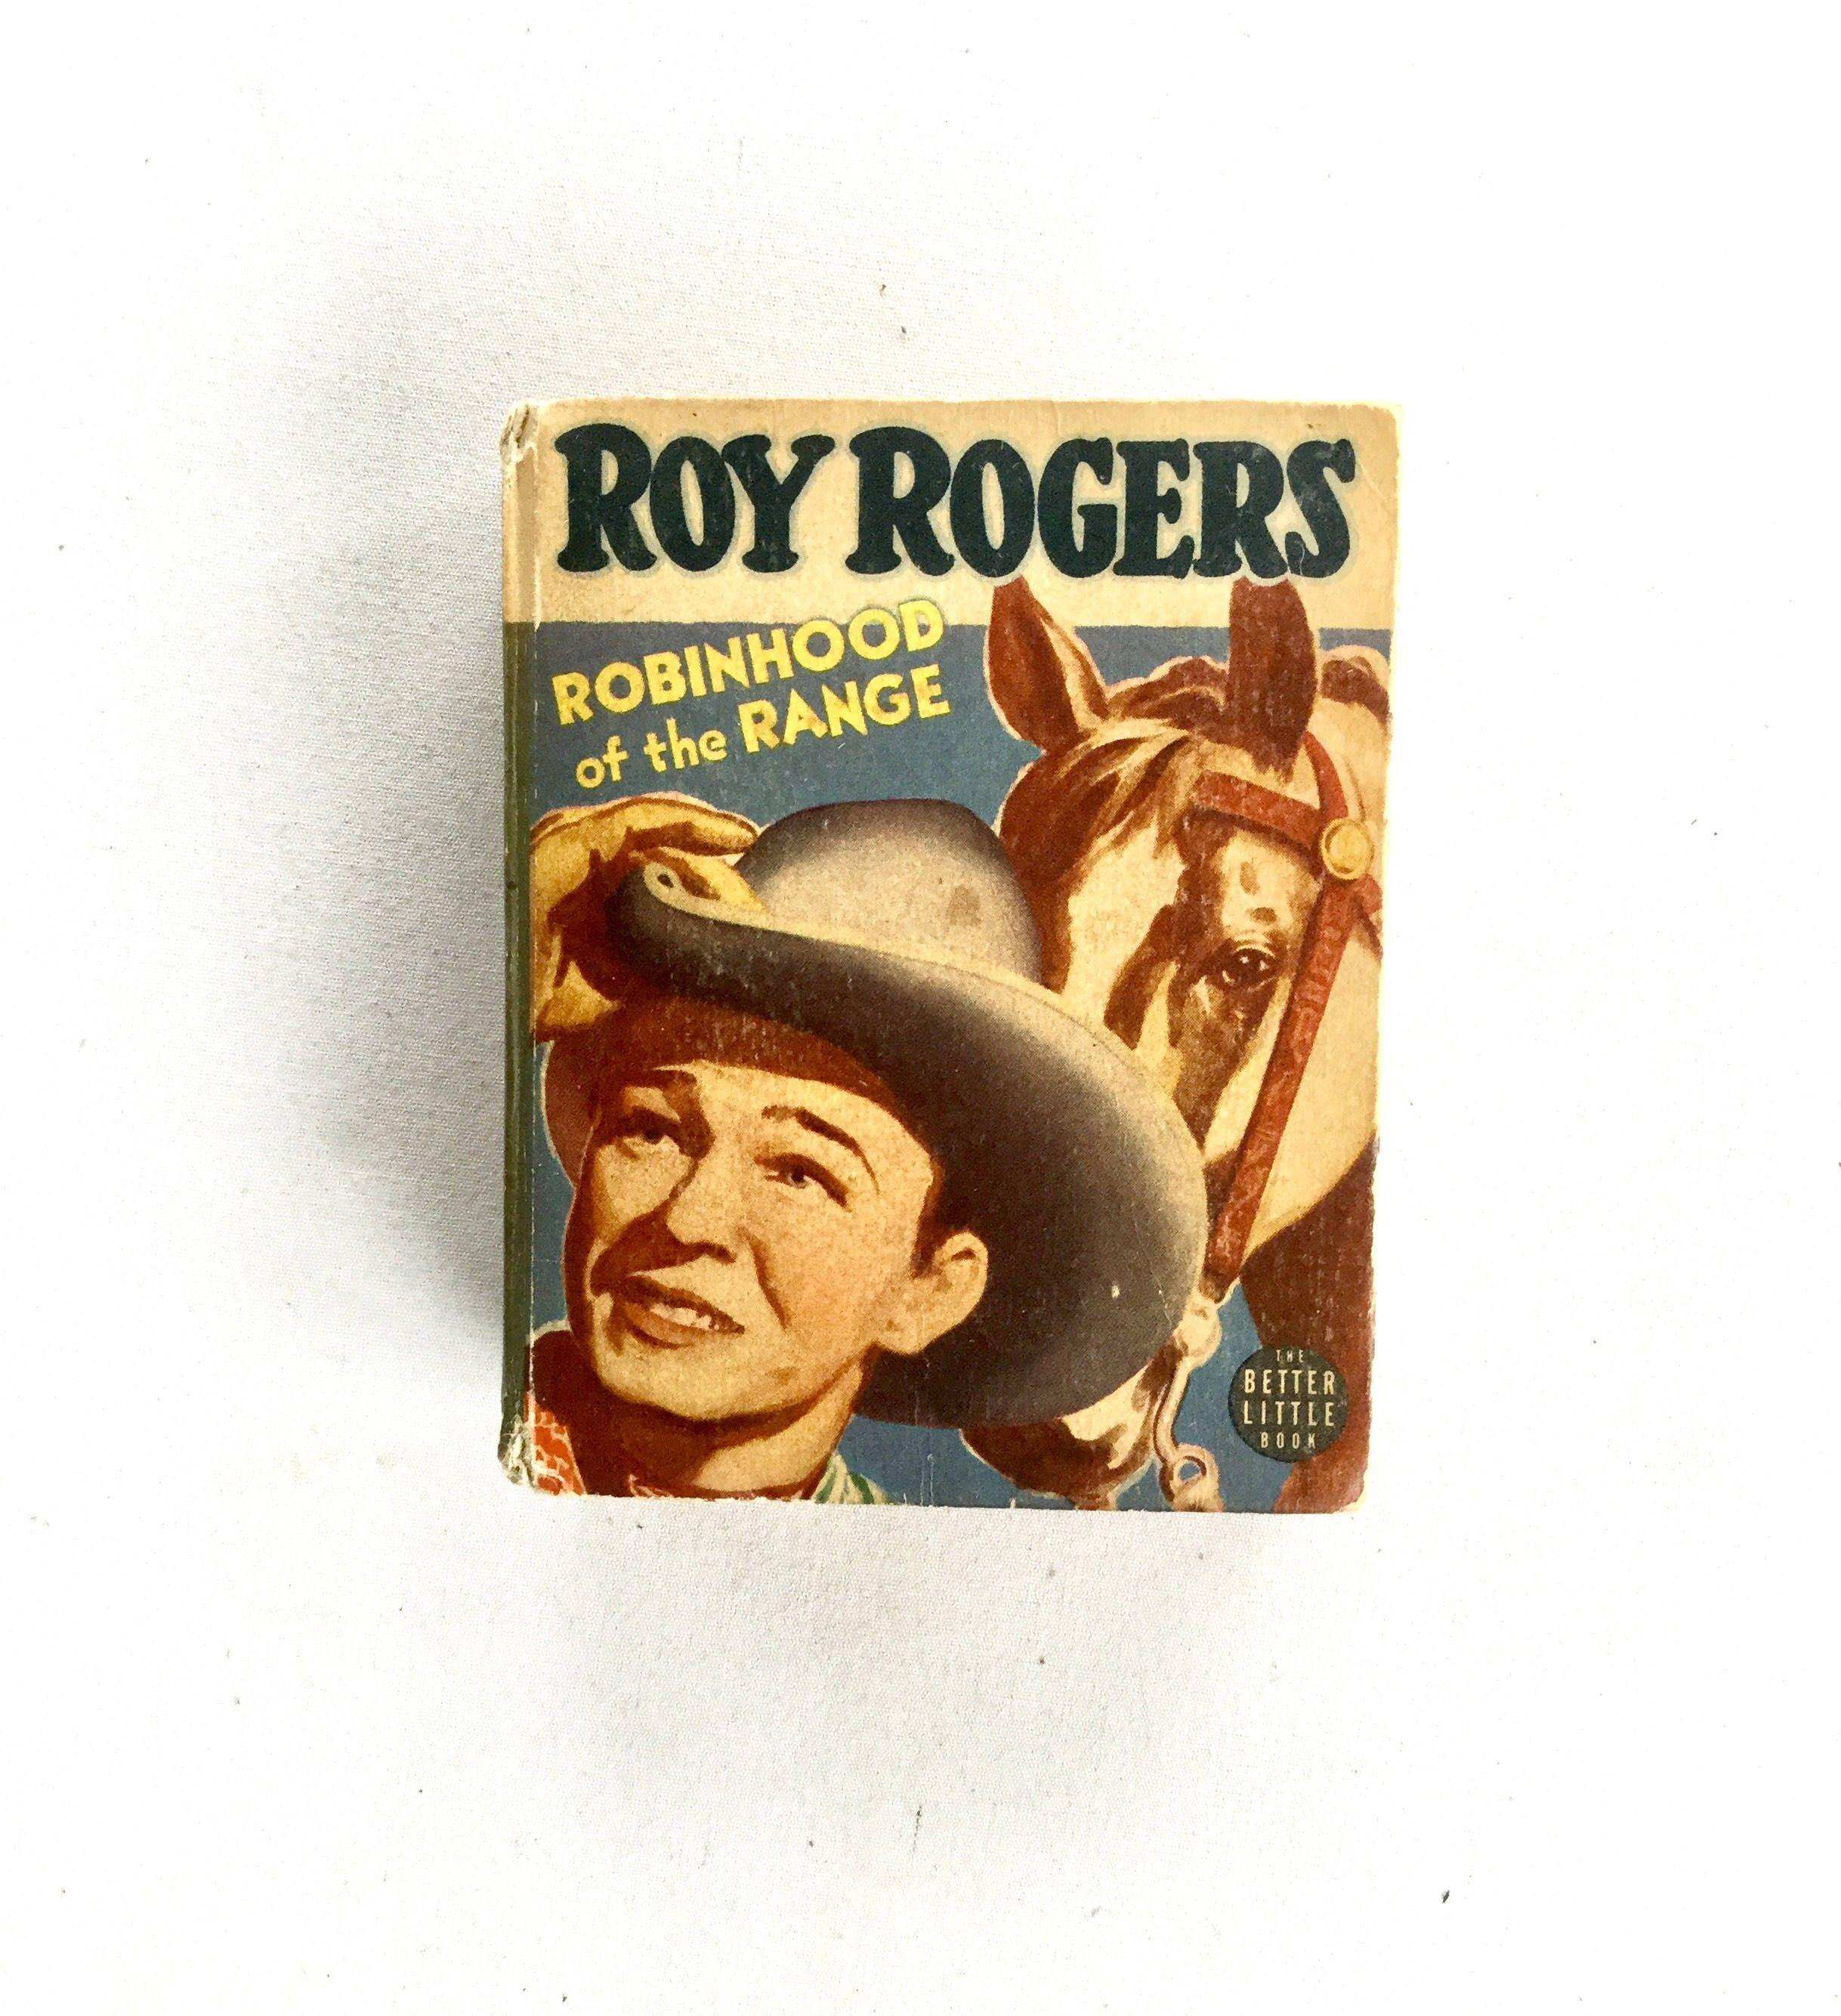 Big little book roy rogers robinhood of the range 1942 by